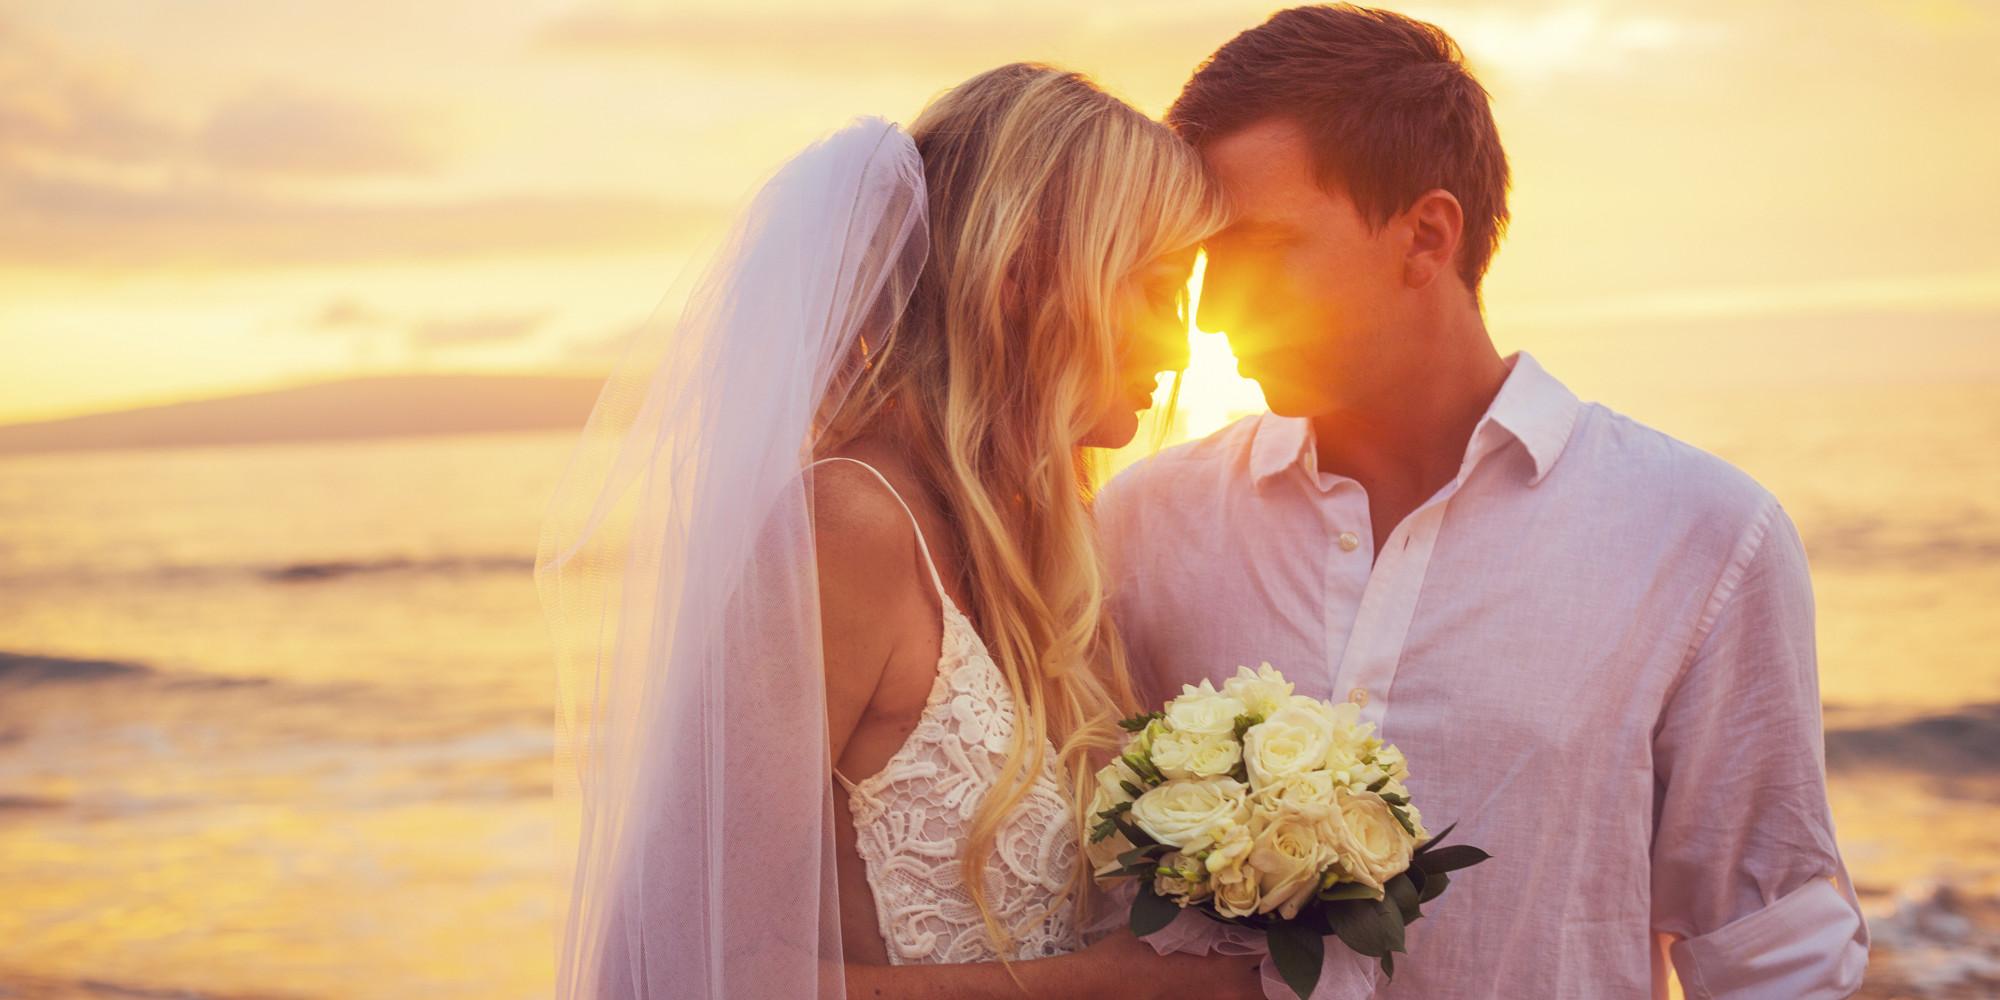 Matrimonio In Europa : Reasons first look wedding photos are stupid huffpost